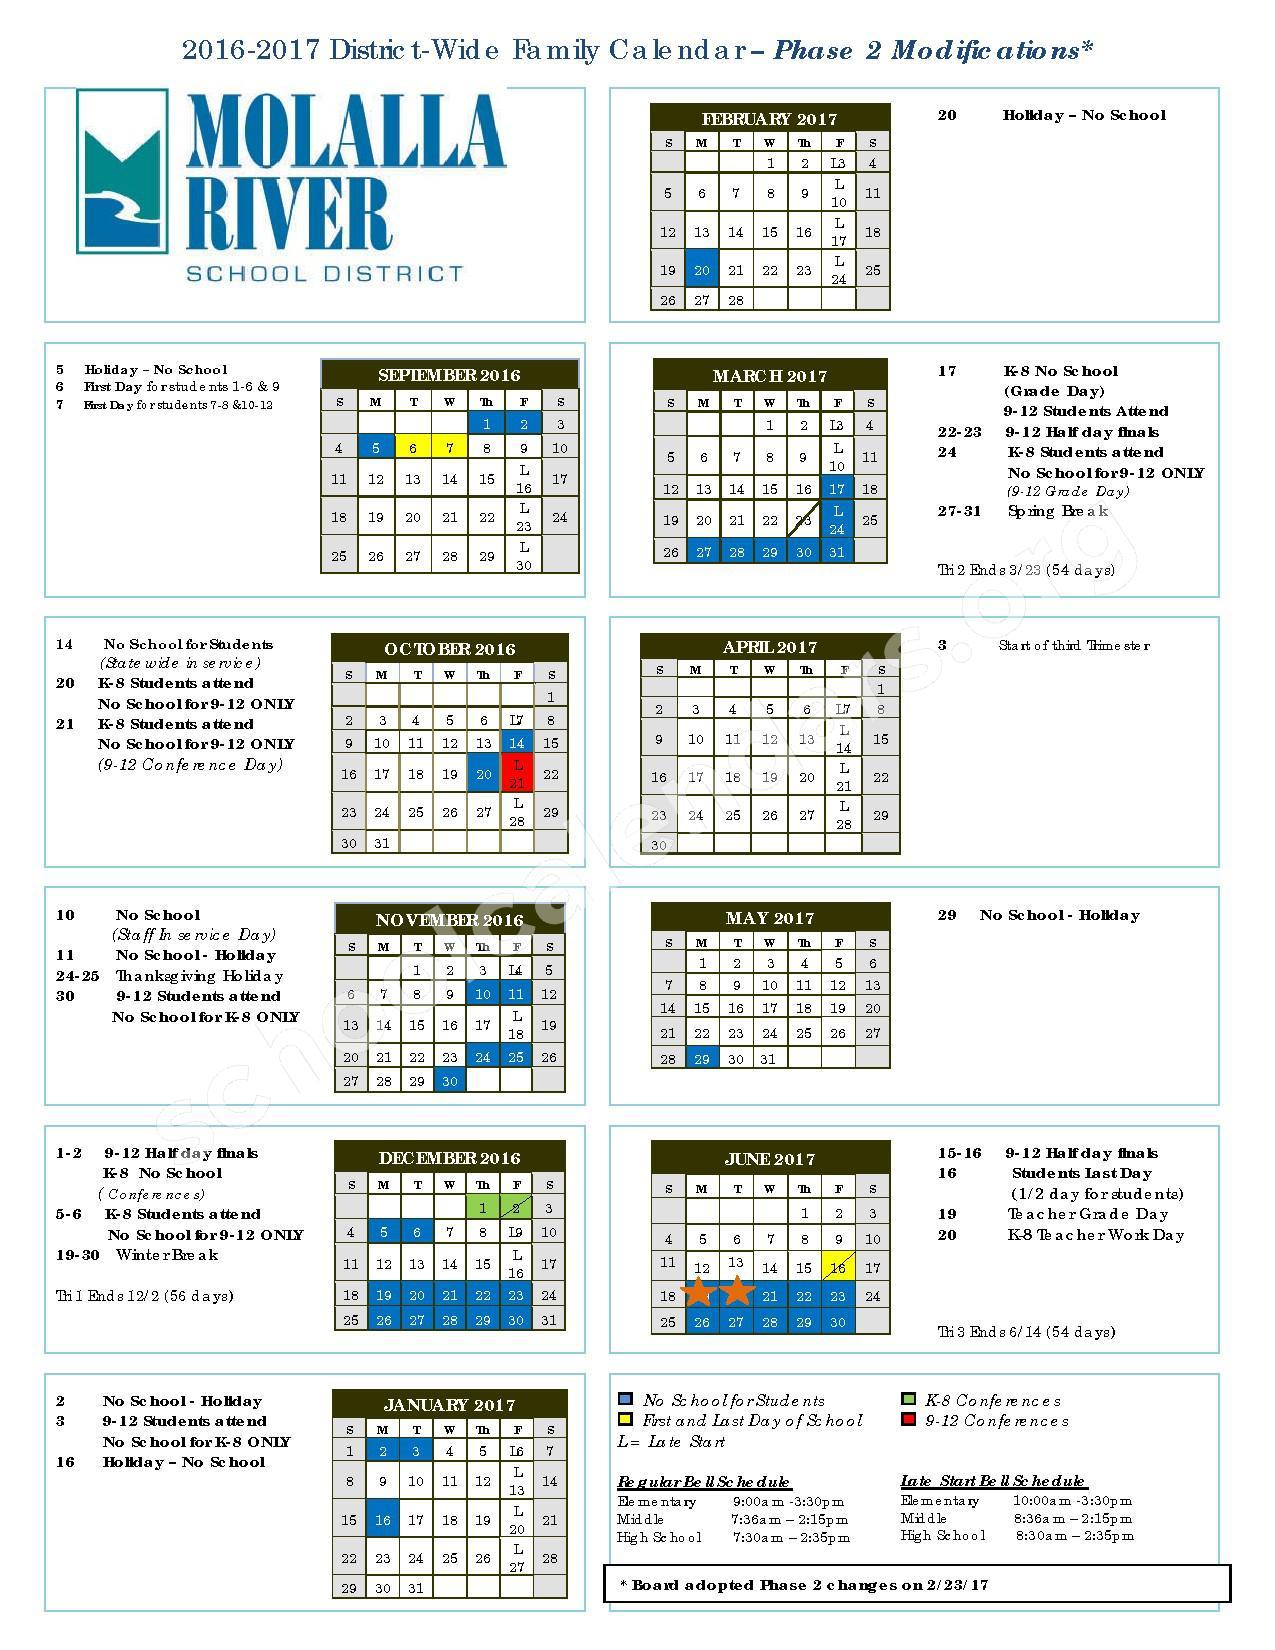 2016 - 2017 District Calendar – Molalla River School District – page 1